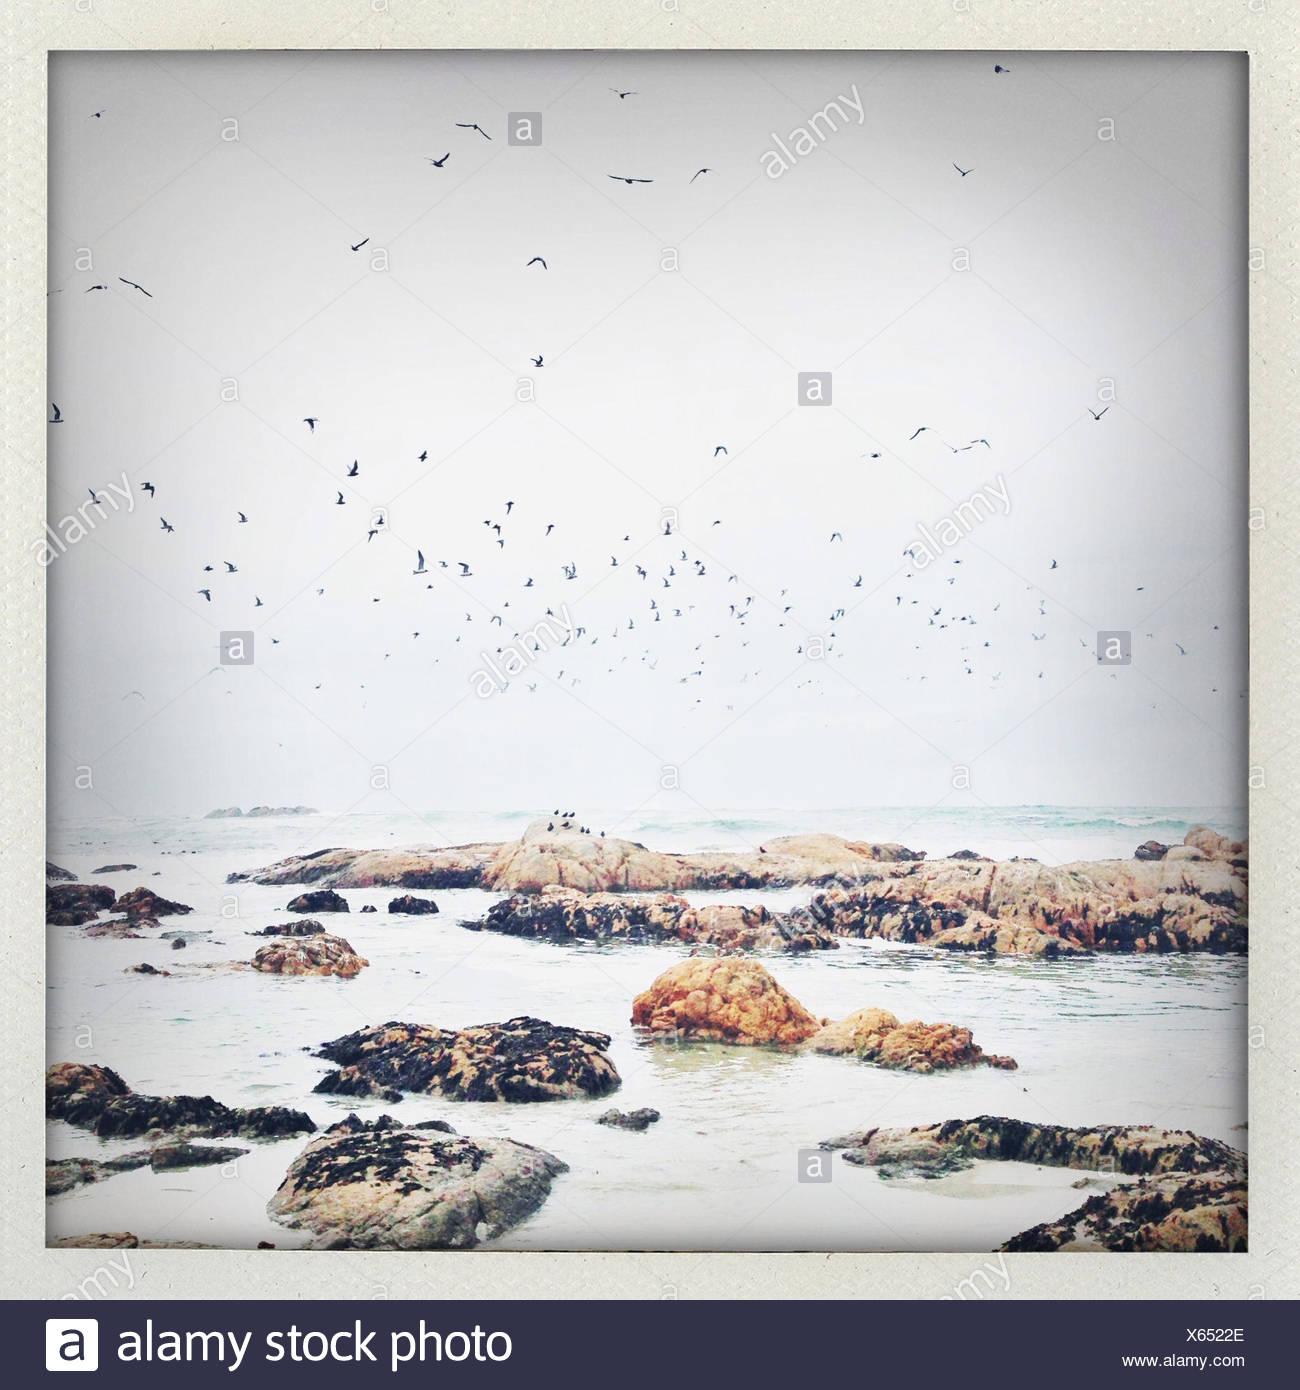 Flock of birds in sky over shoreline - Stock Image